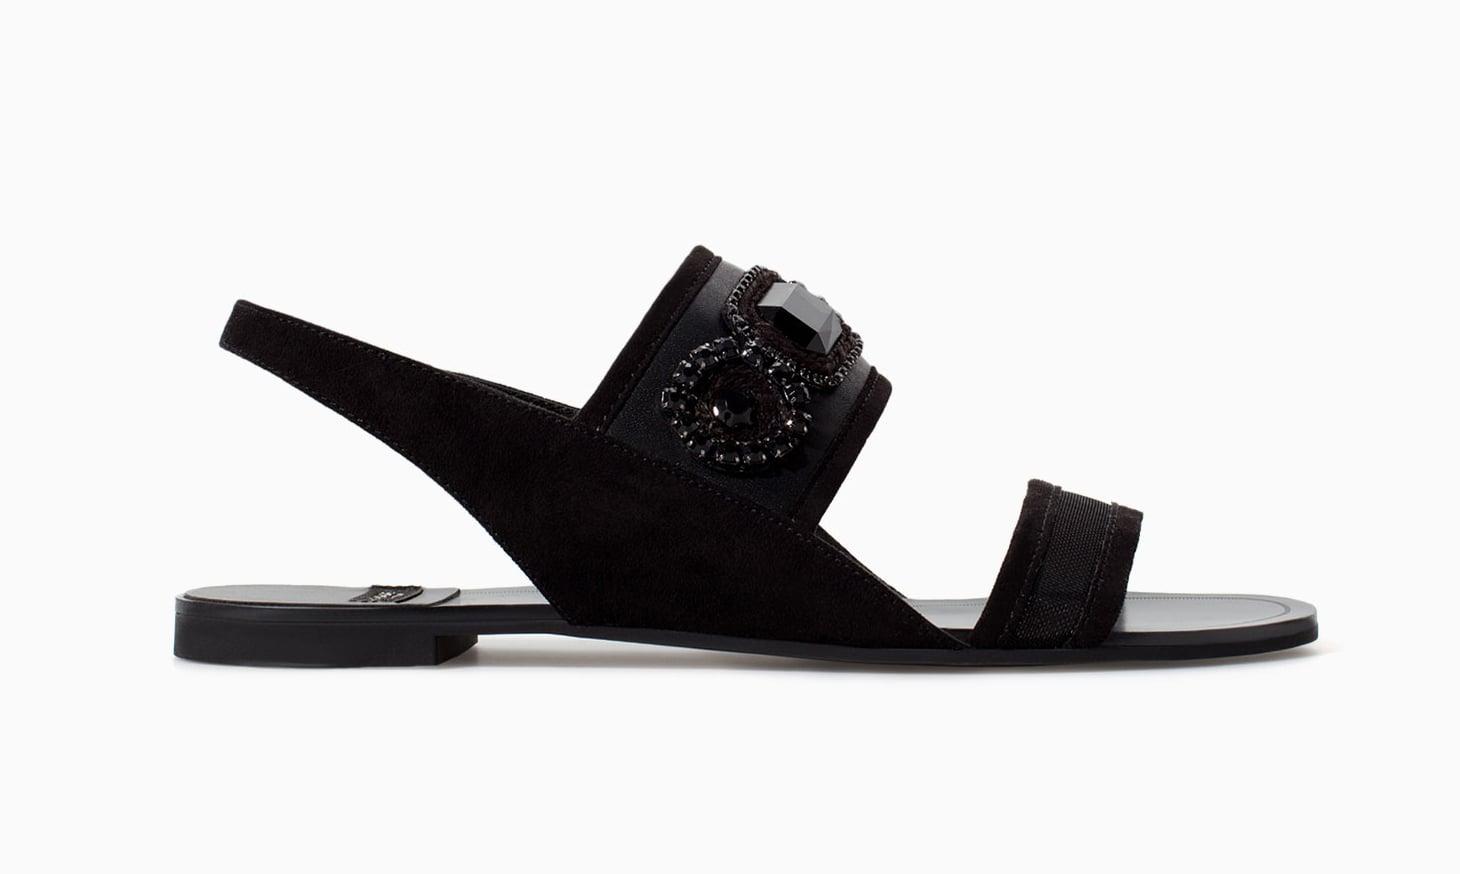 Zara black flat sandals with rhinestones ($60)